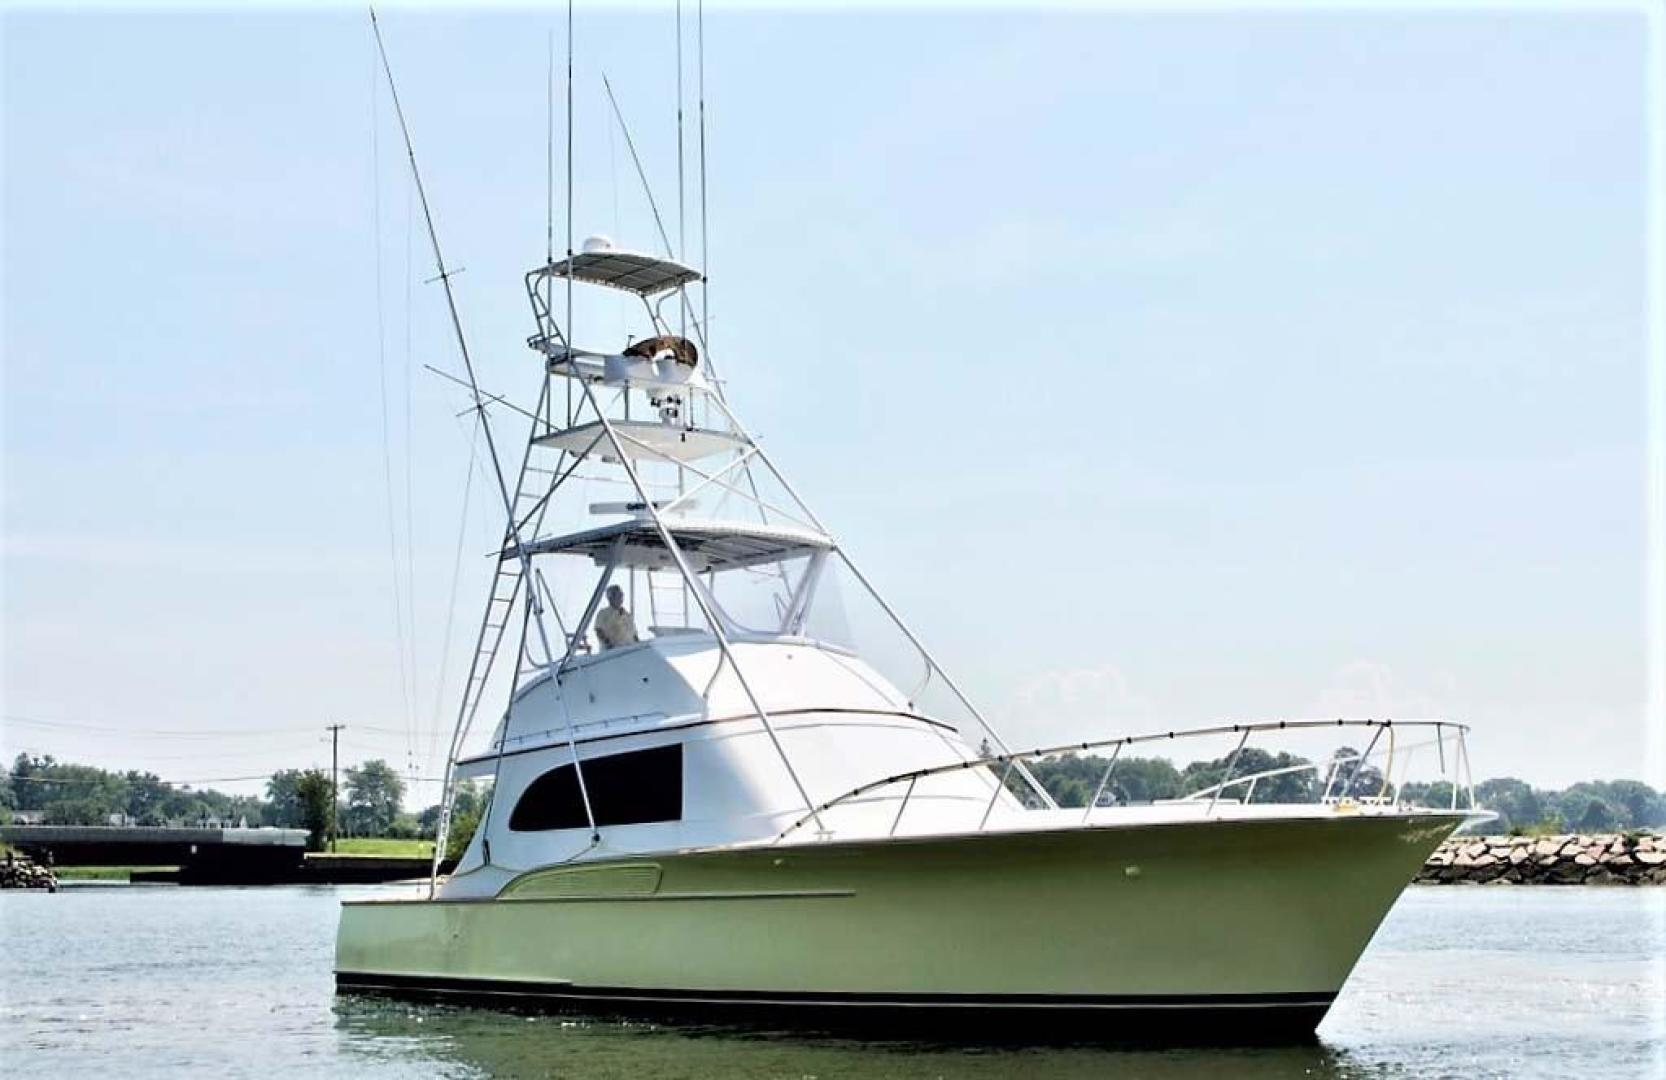 Buddy Davis-47 Sportfish 1988-Yellowfin Milford-Connecticut-United States-Profile-1031233   Thumbnail